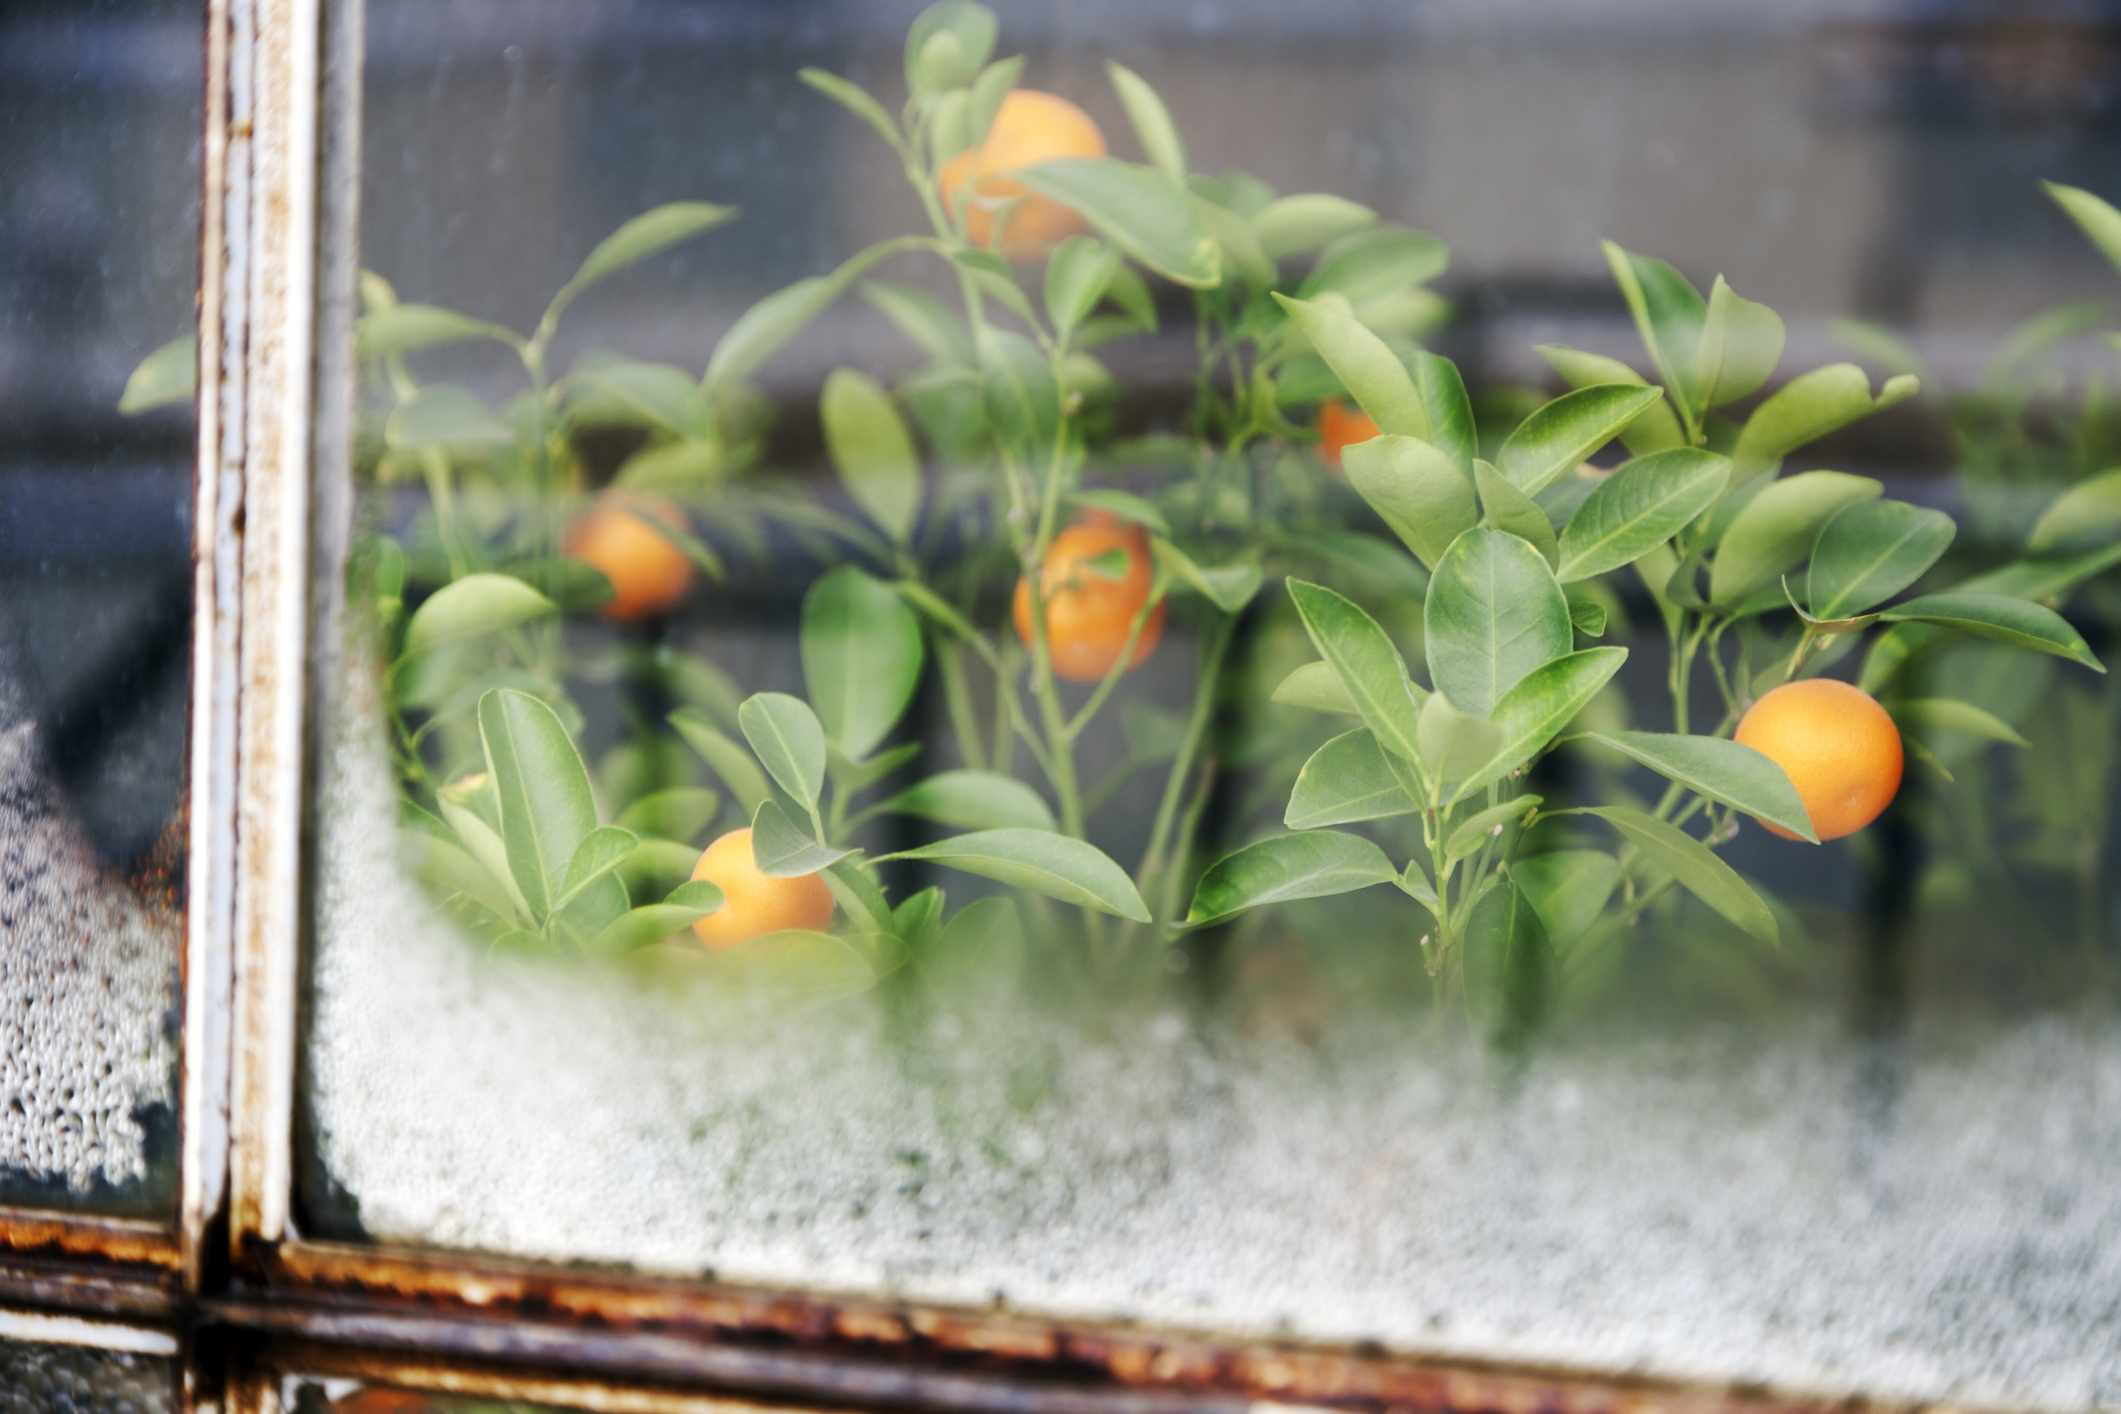 Calamondin tree beside frosty windowsill